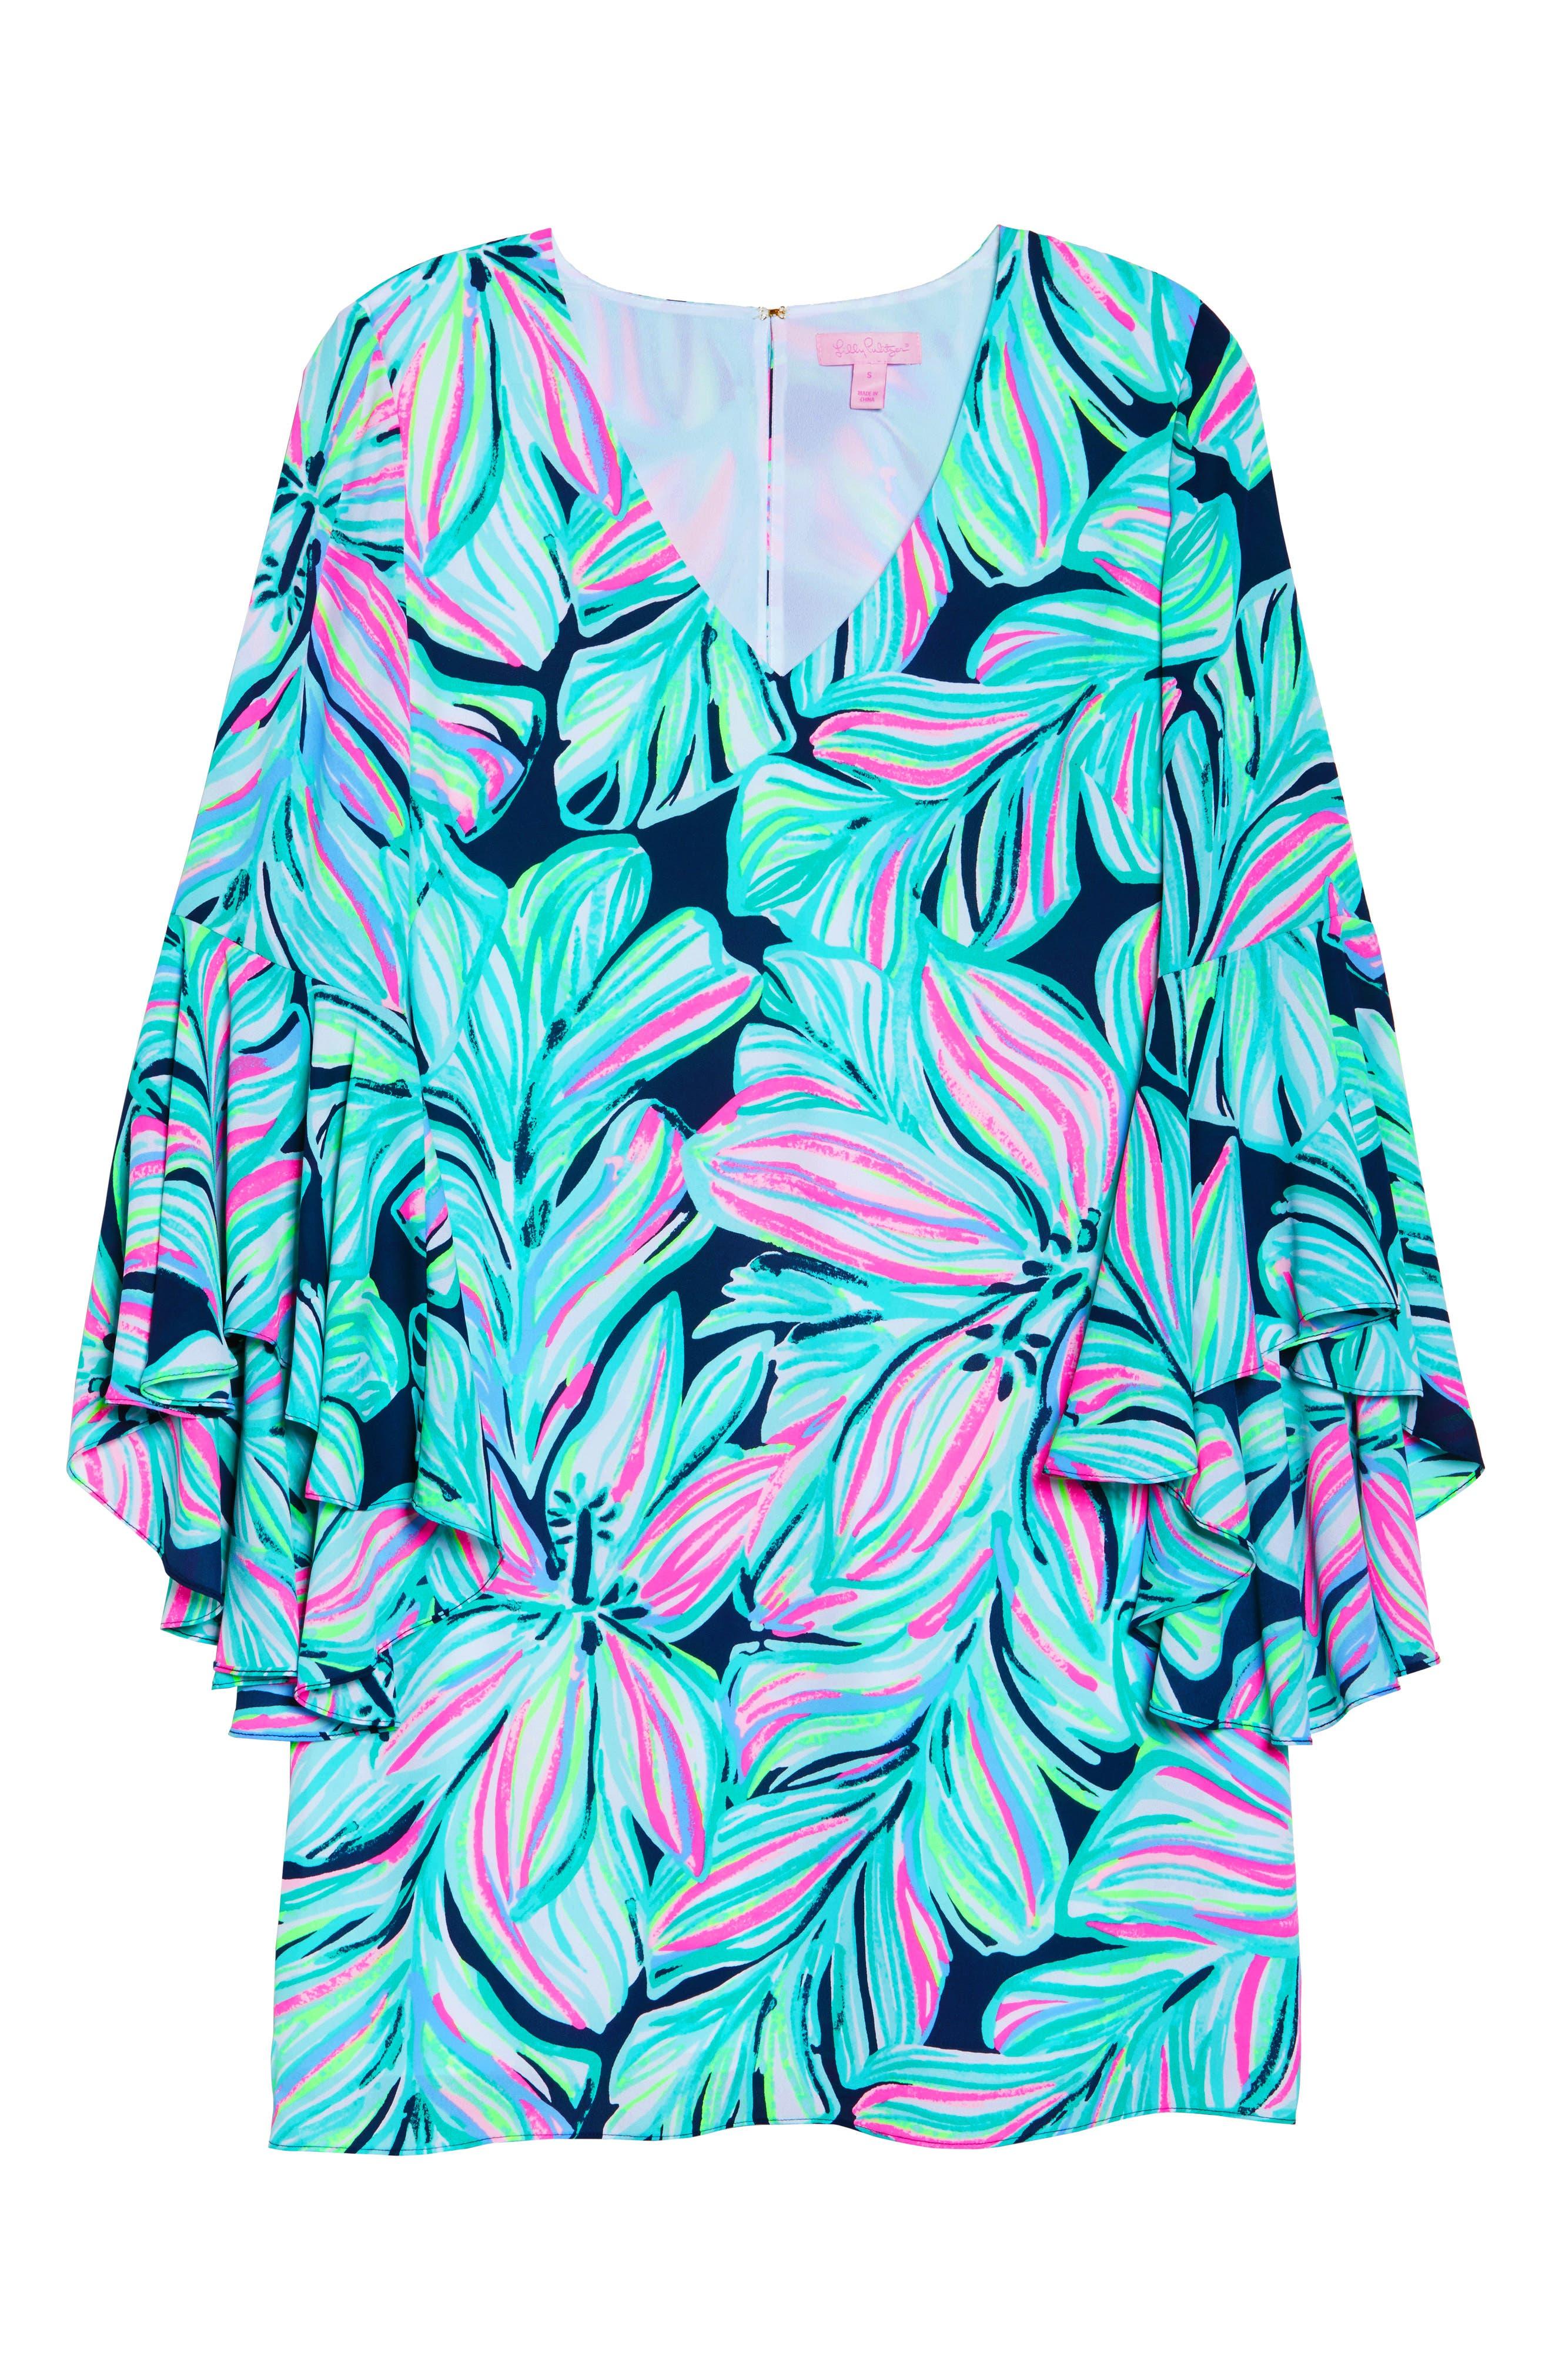 Rosalia Bell Sleeve A-Line Dress,                             Alternate thumbnail 6, color,                             High Tide Navy Dancing Lady